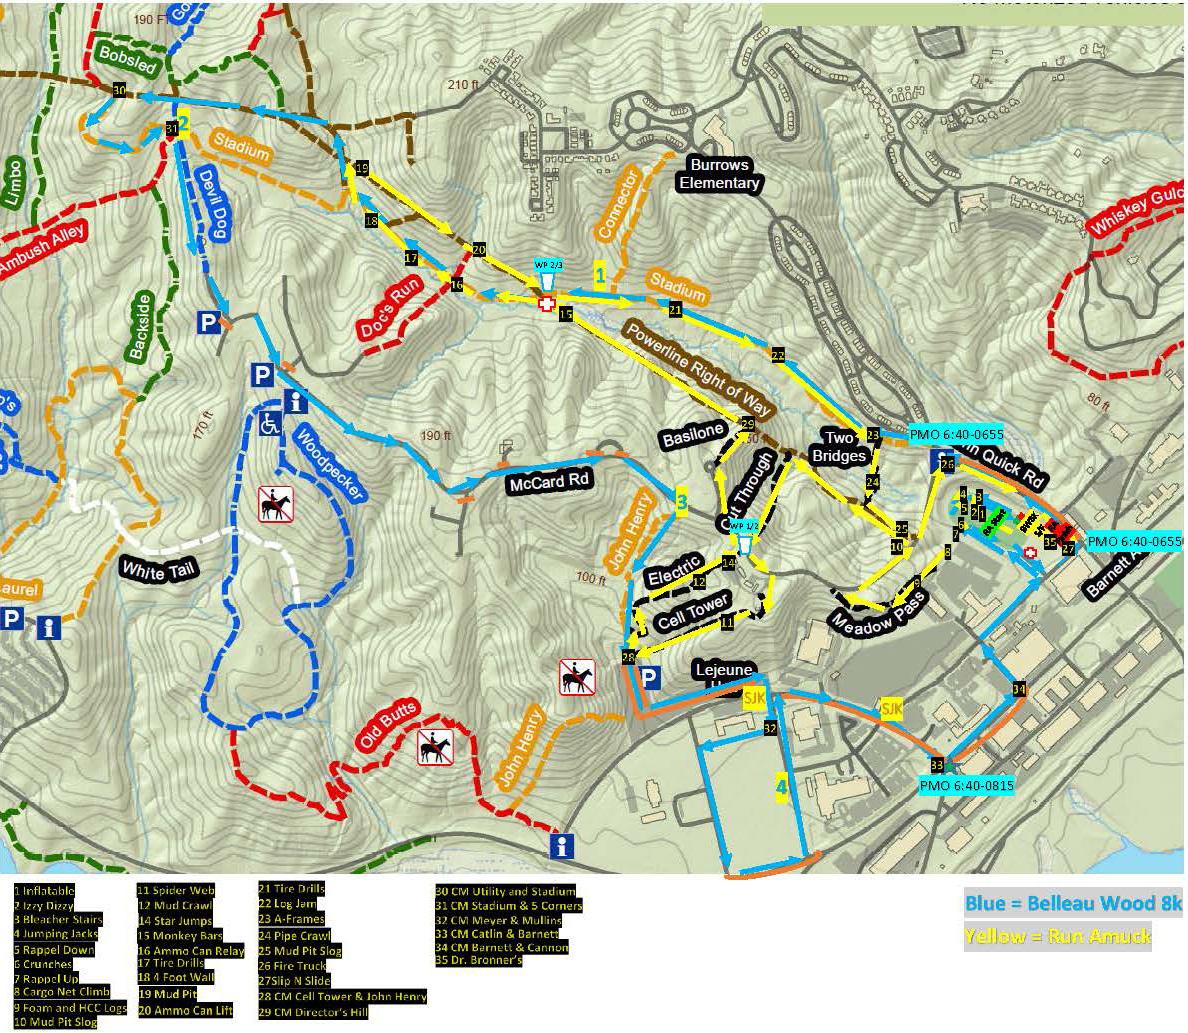 Belleau Wood 8K Run Amuck combined map